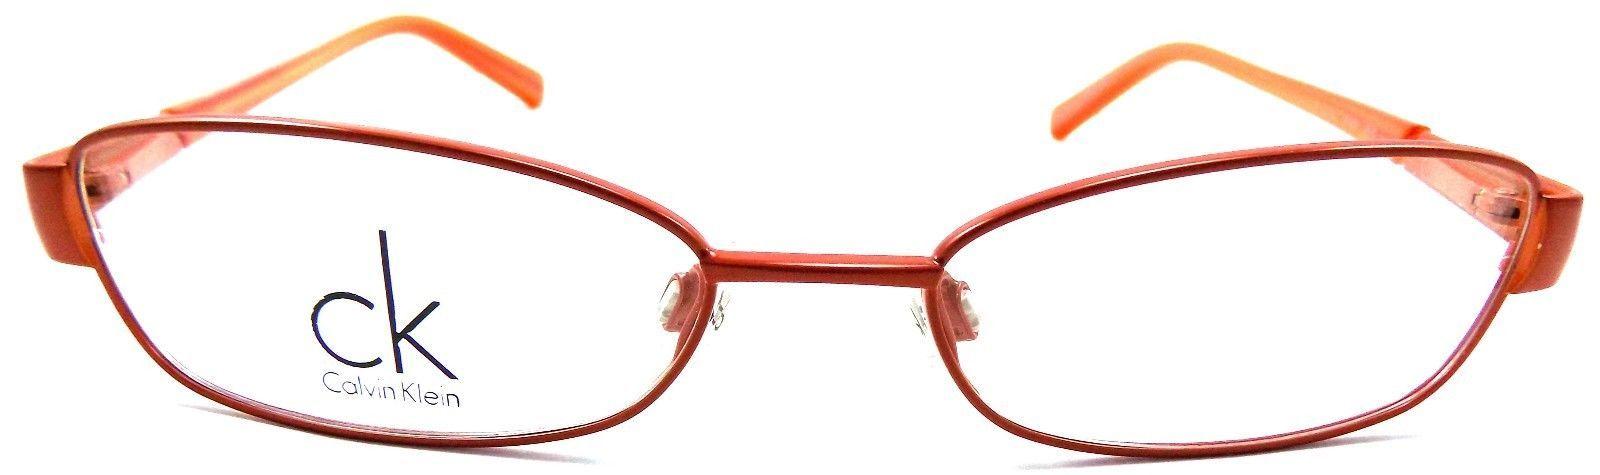 Calvin Klein CK 5149 810 Women's Eyeglasses Frames 51-16-135 Satin Orange